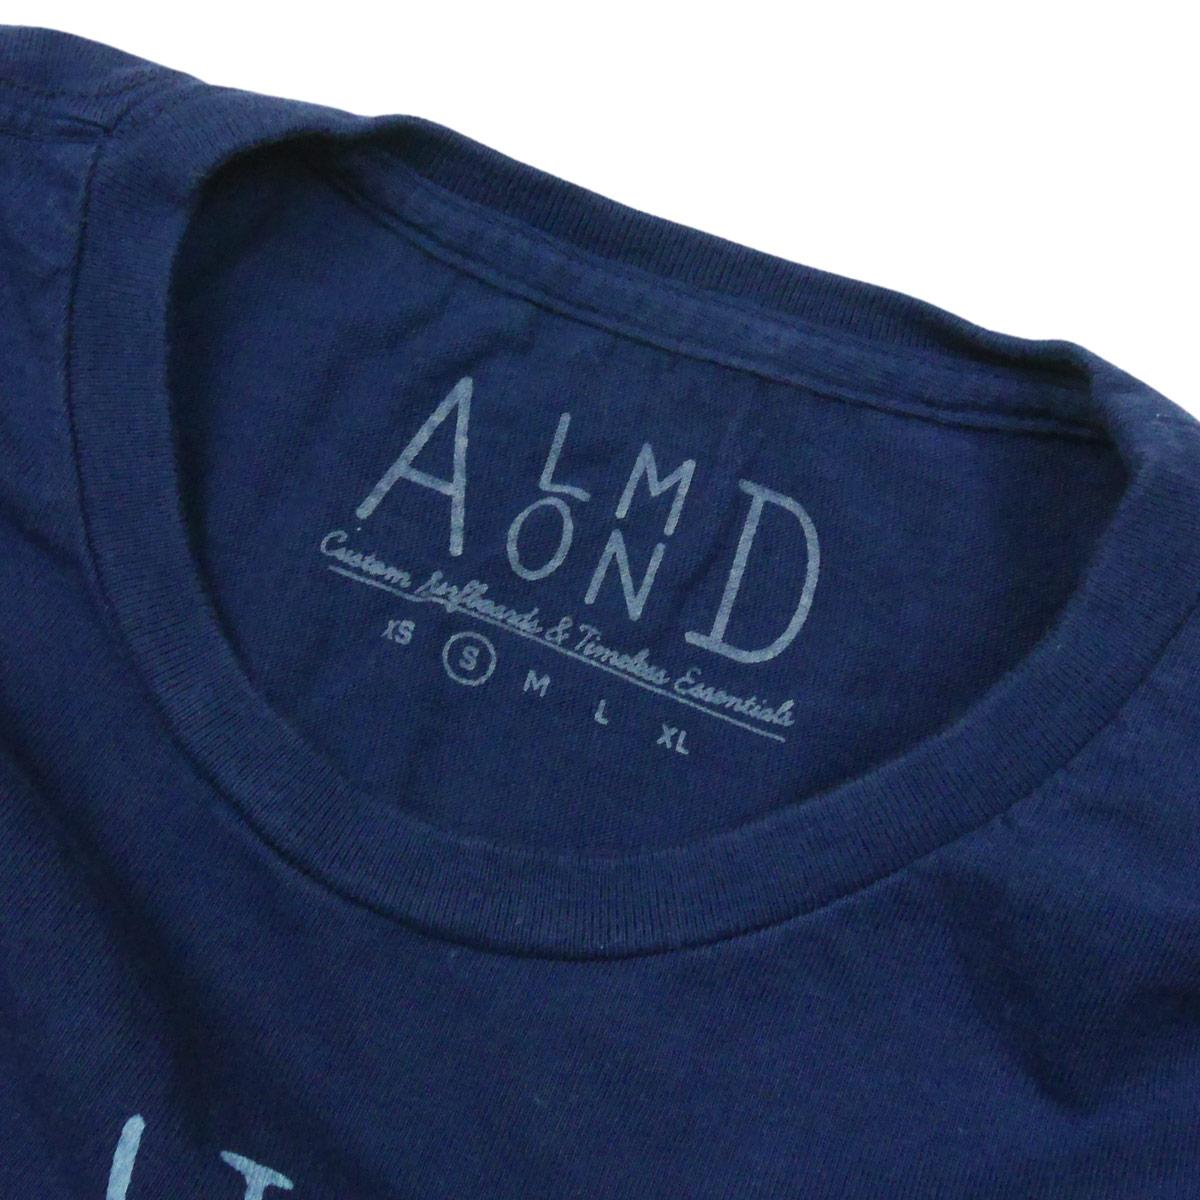 Almond Surf アーモンドサーフボードデザイン KEEP IT SIMPLE S/S TEE